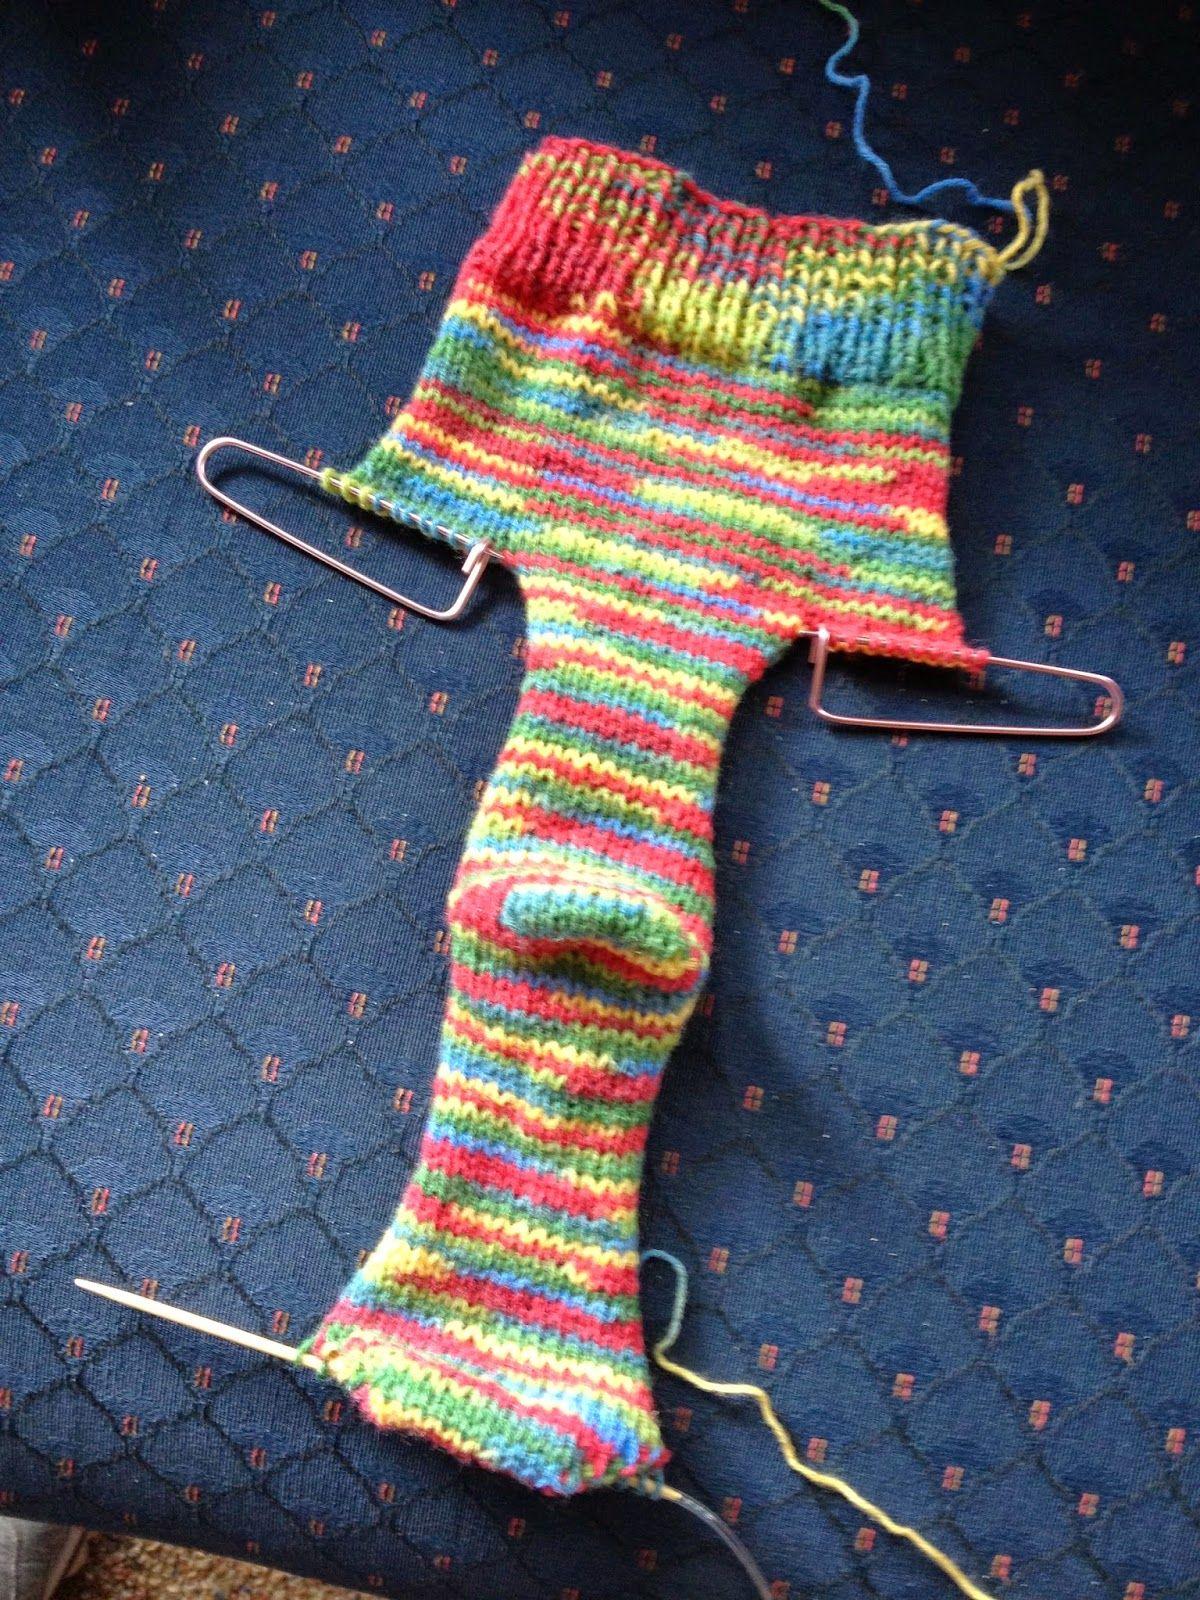 Free two needle socks knit pattern killer crafts crafty two needle socks knit pattern killer crafts crafty killers bankloansurffo Images